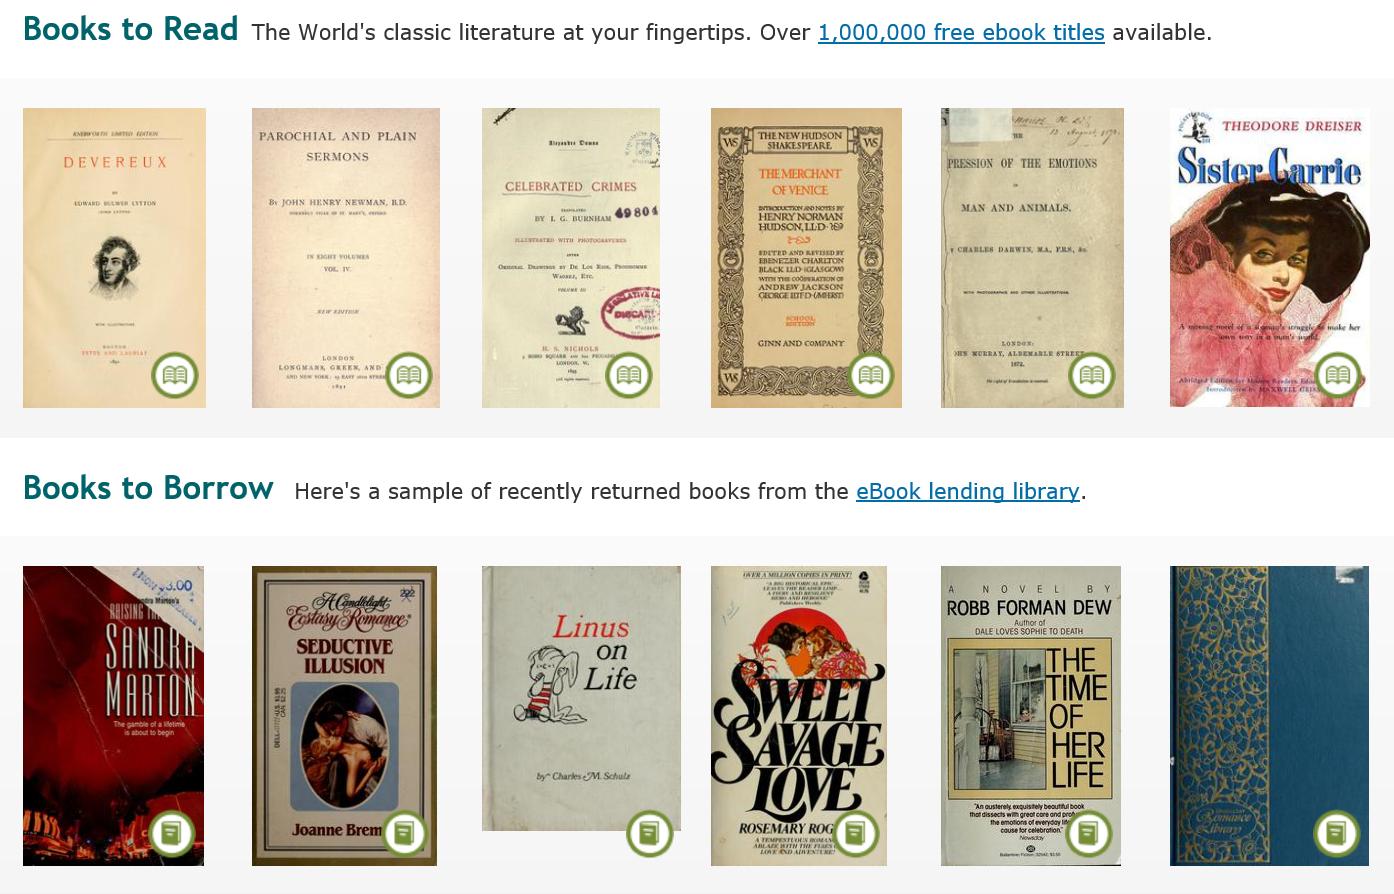 Online copies of books...?